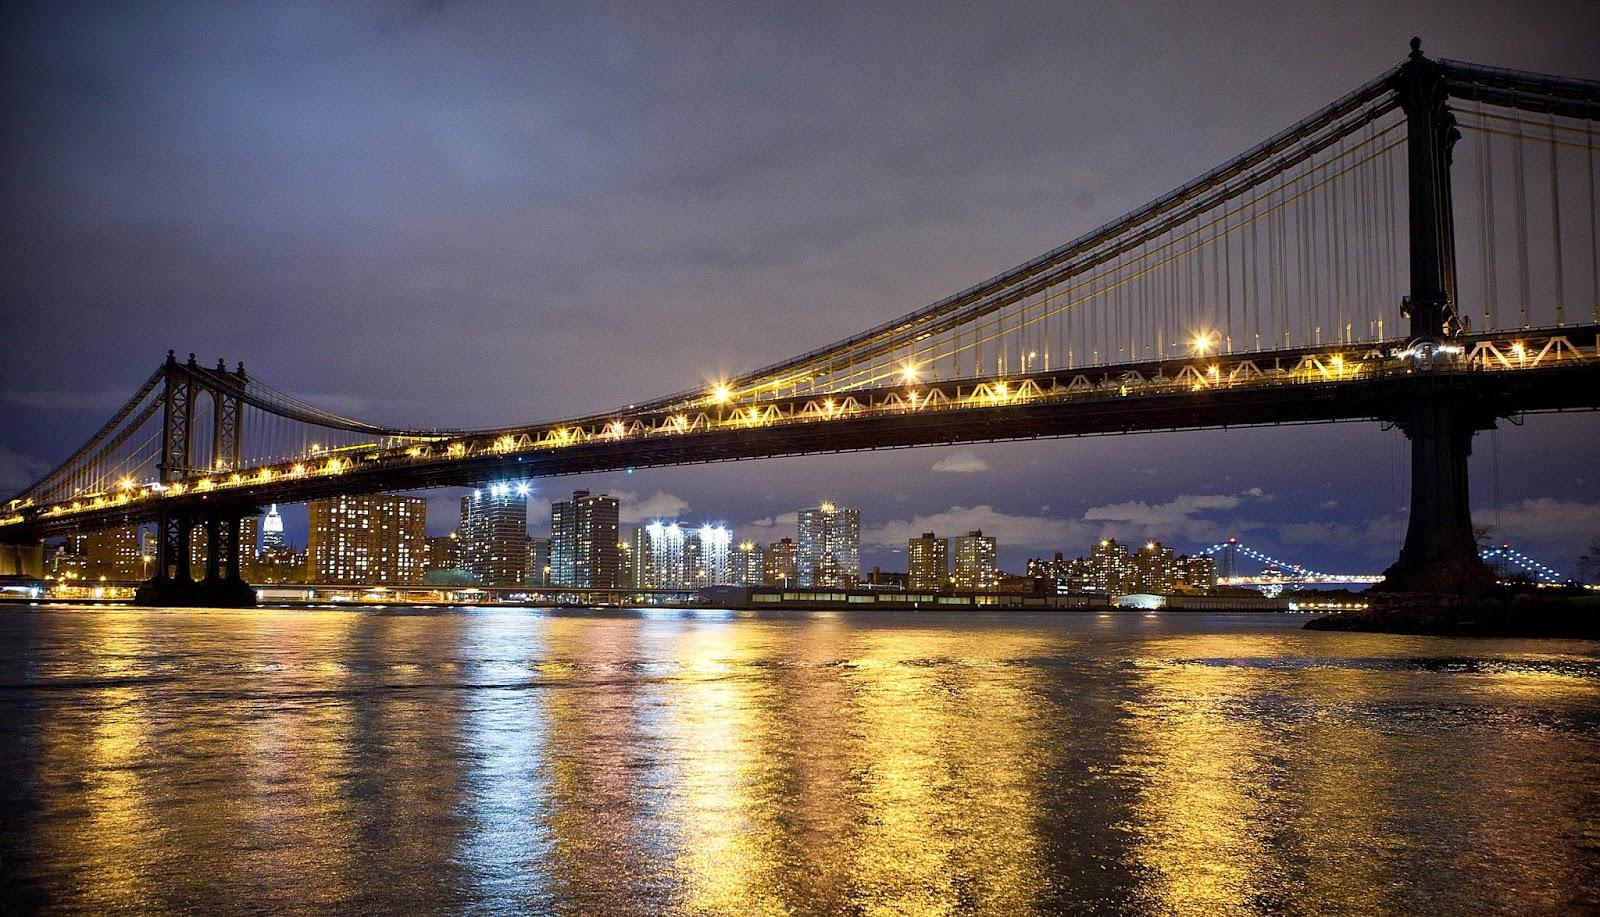 Brooklyn new york bridge chinatown manhattan bridge con edison